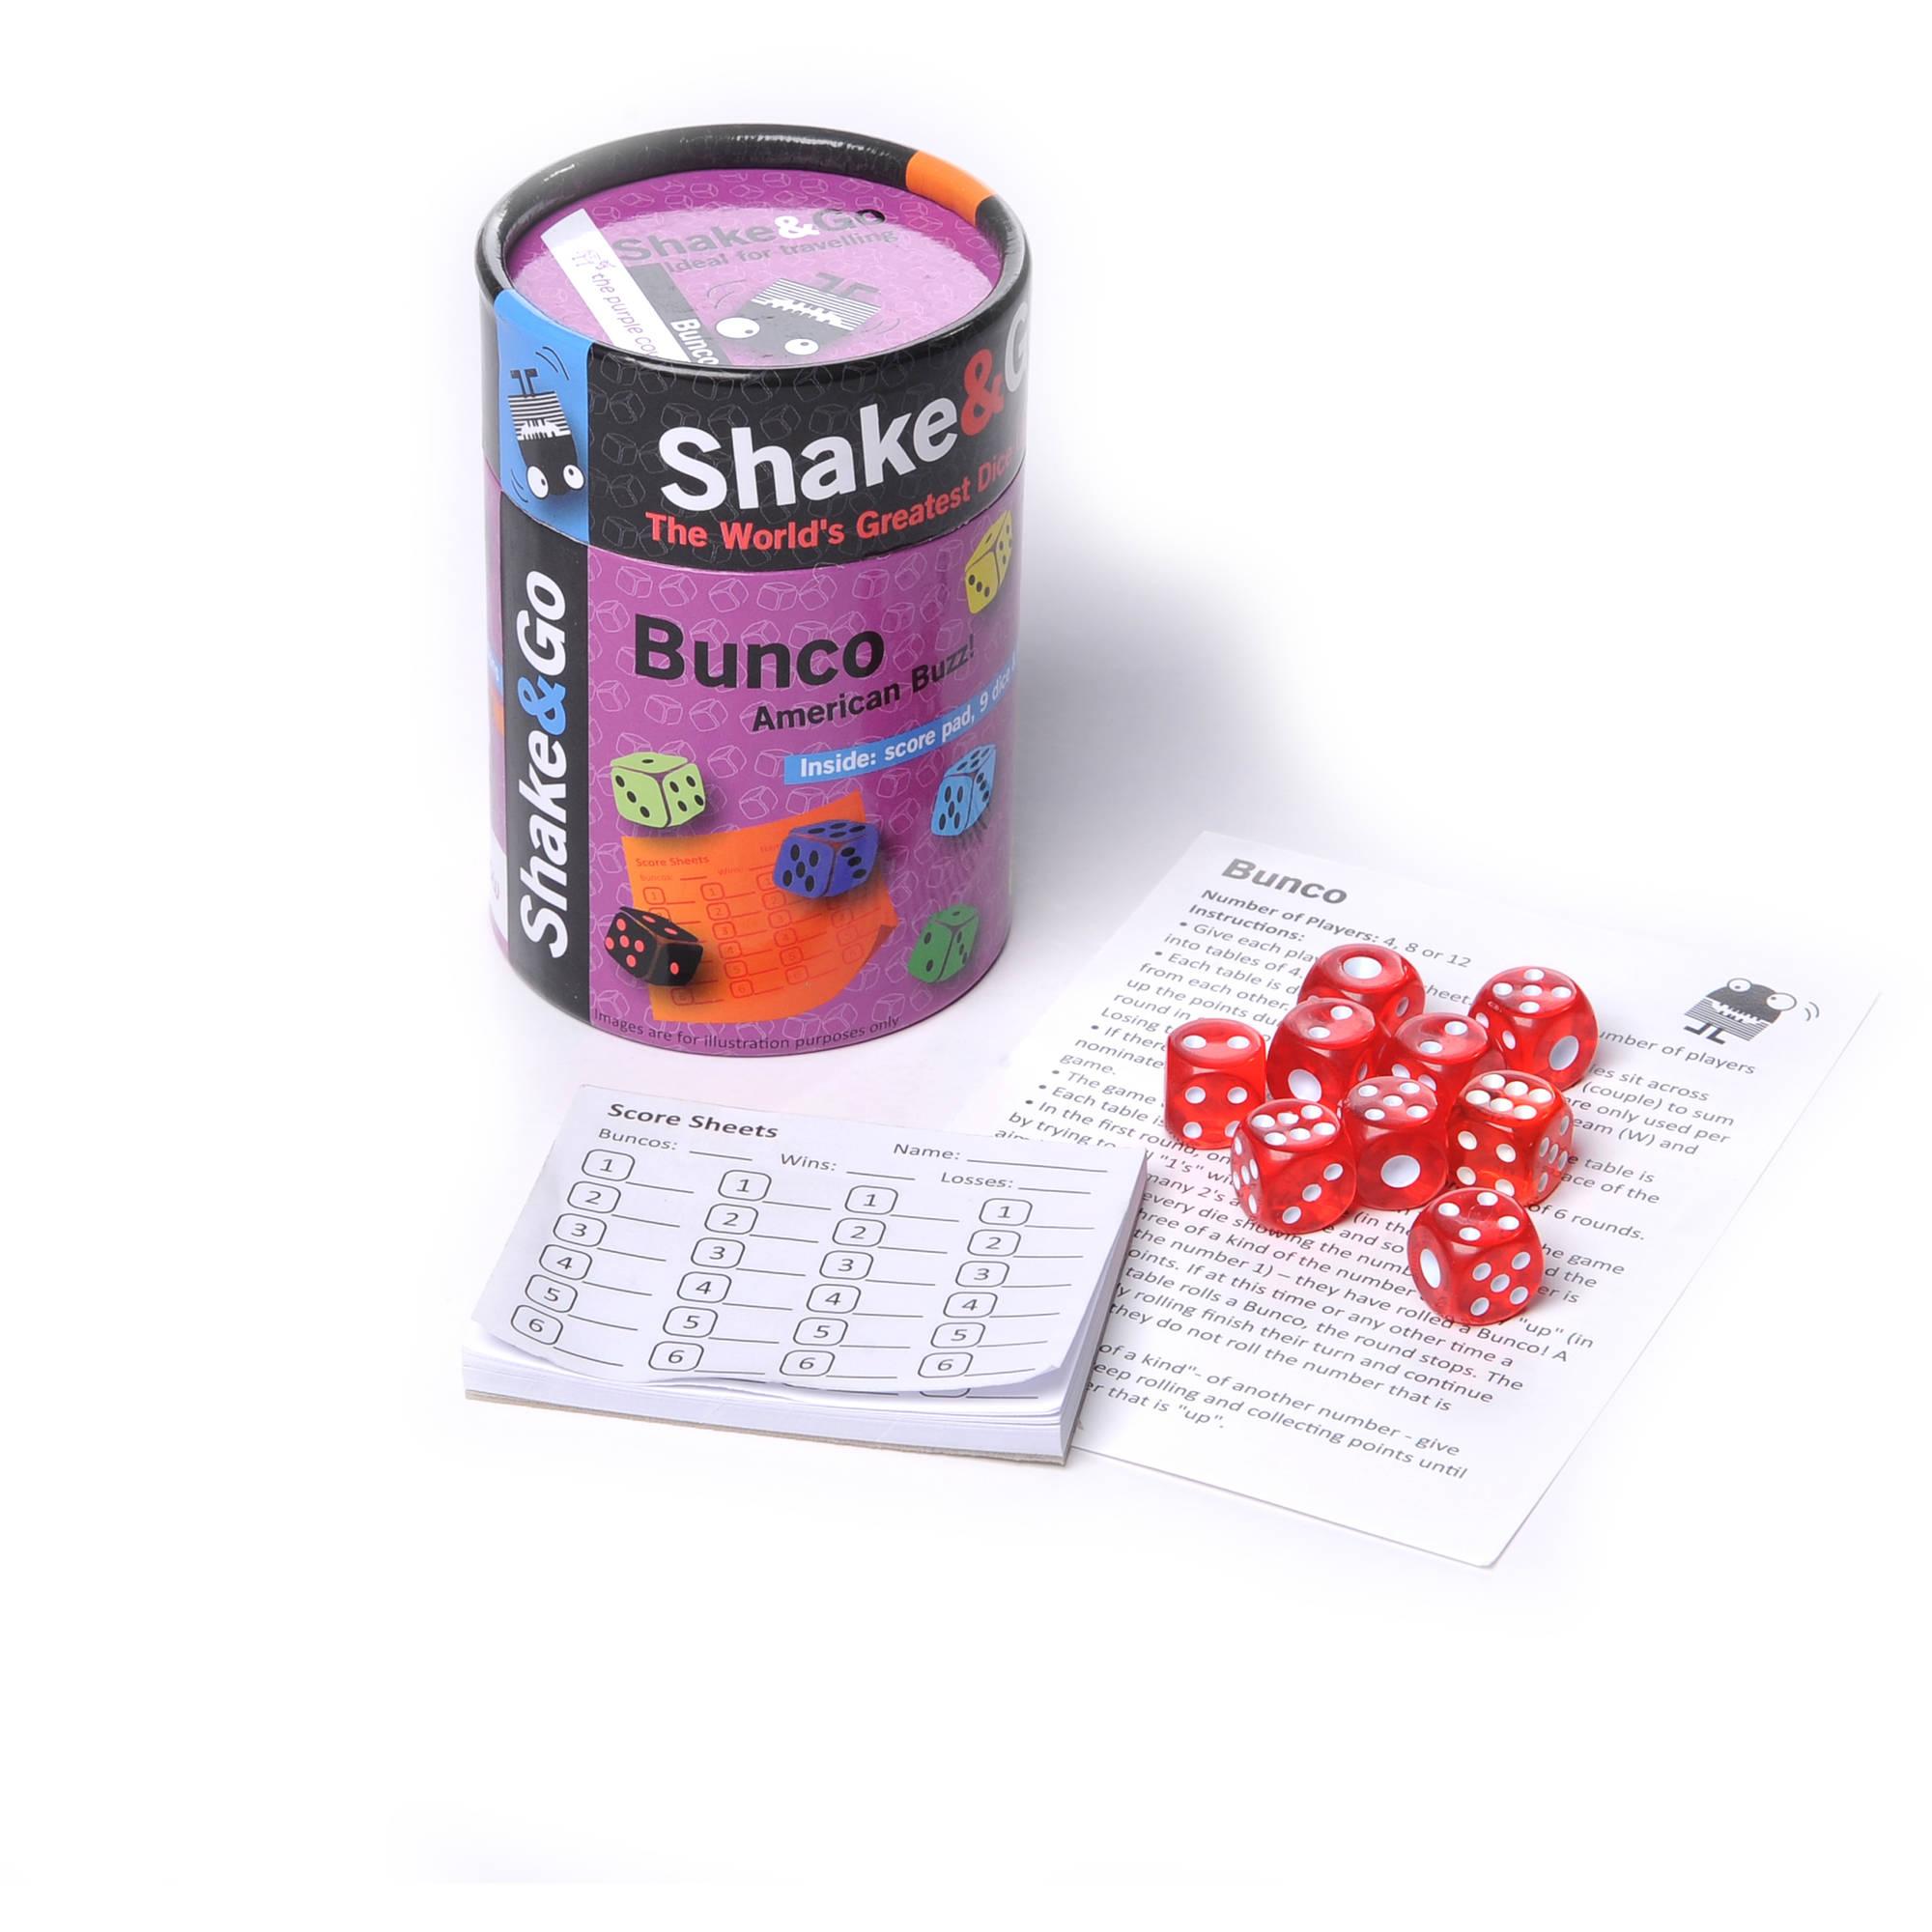 Shake and Go Bunco